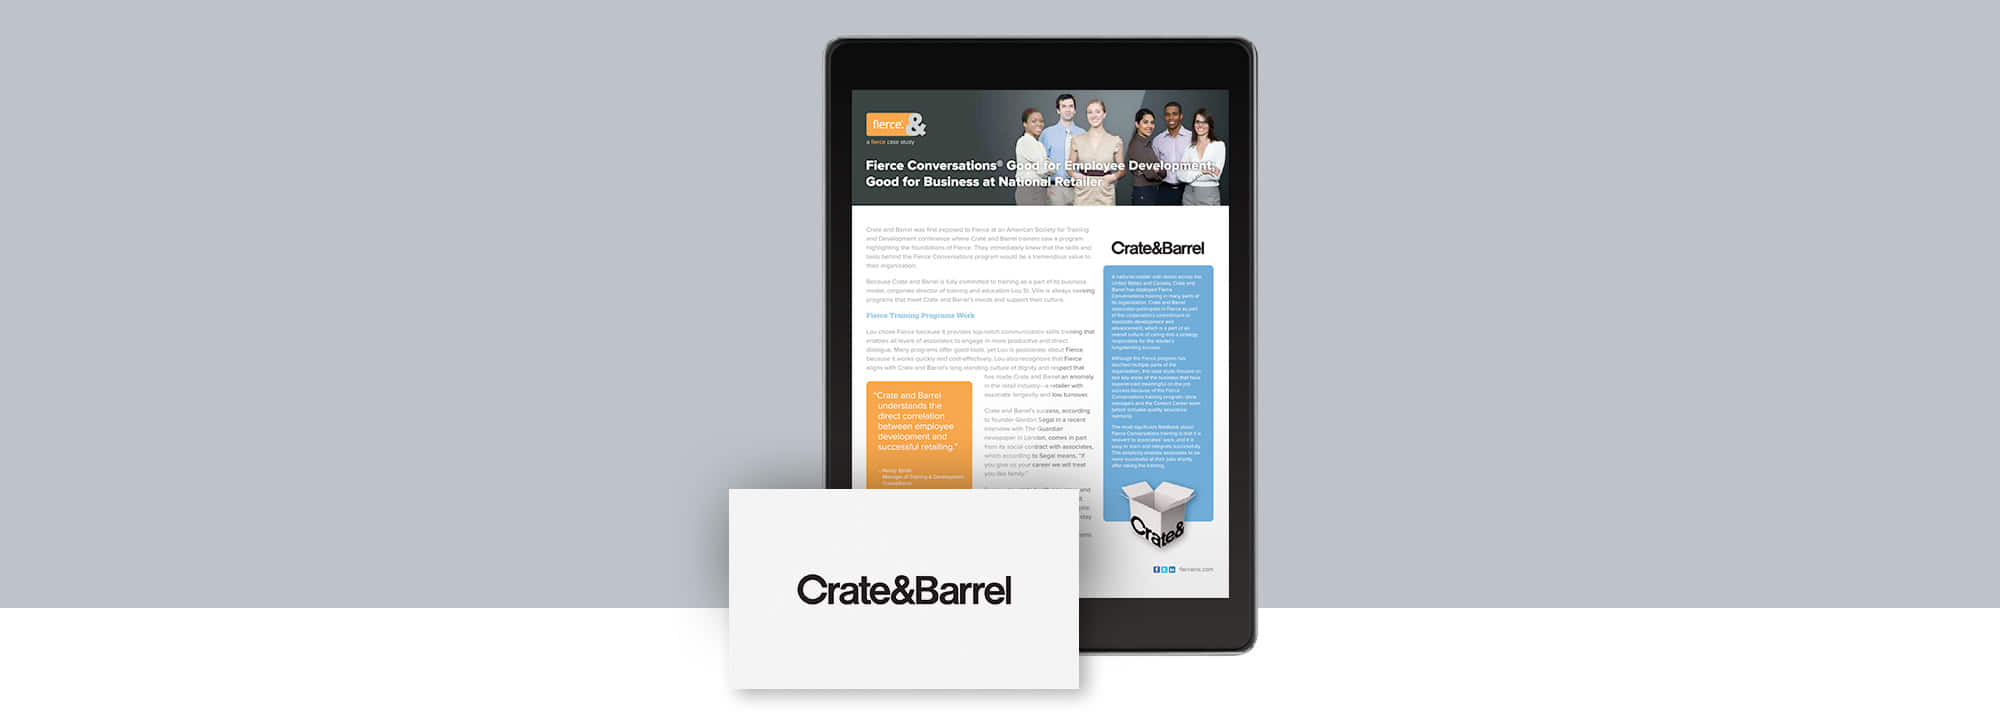 Fierce Conversations Crate & Barrel Case Study